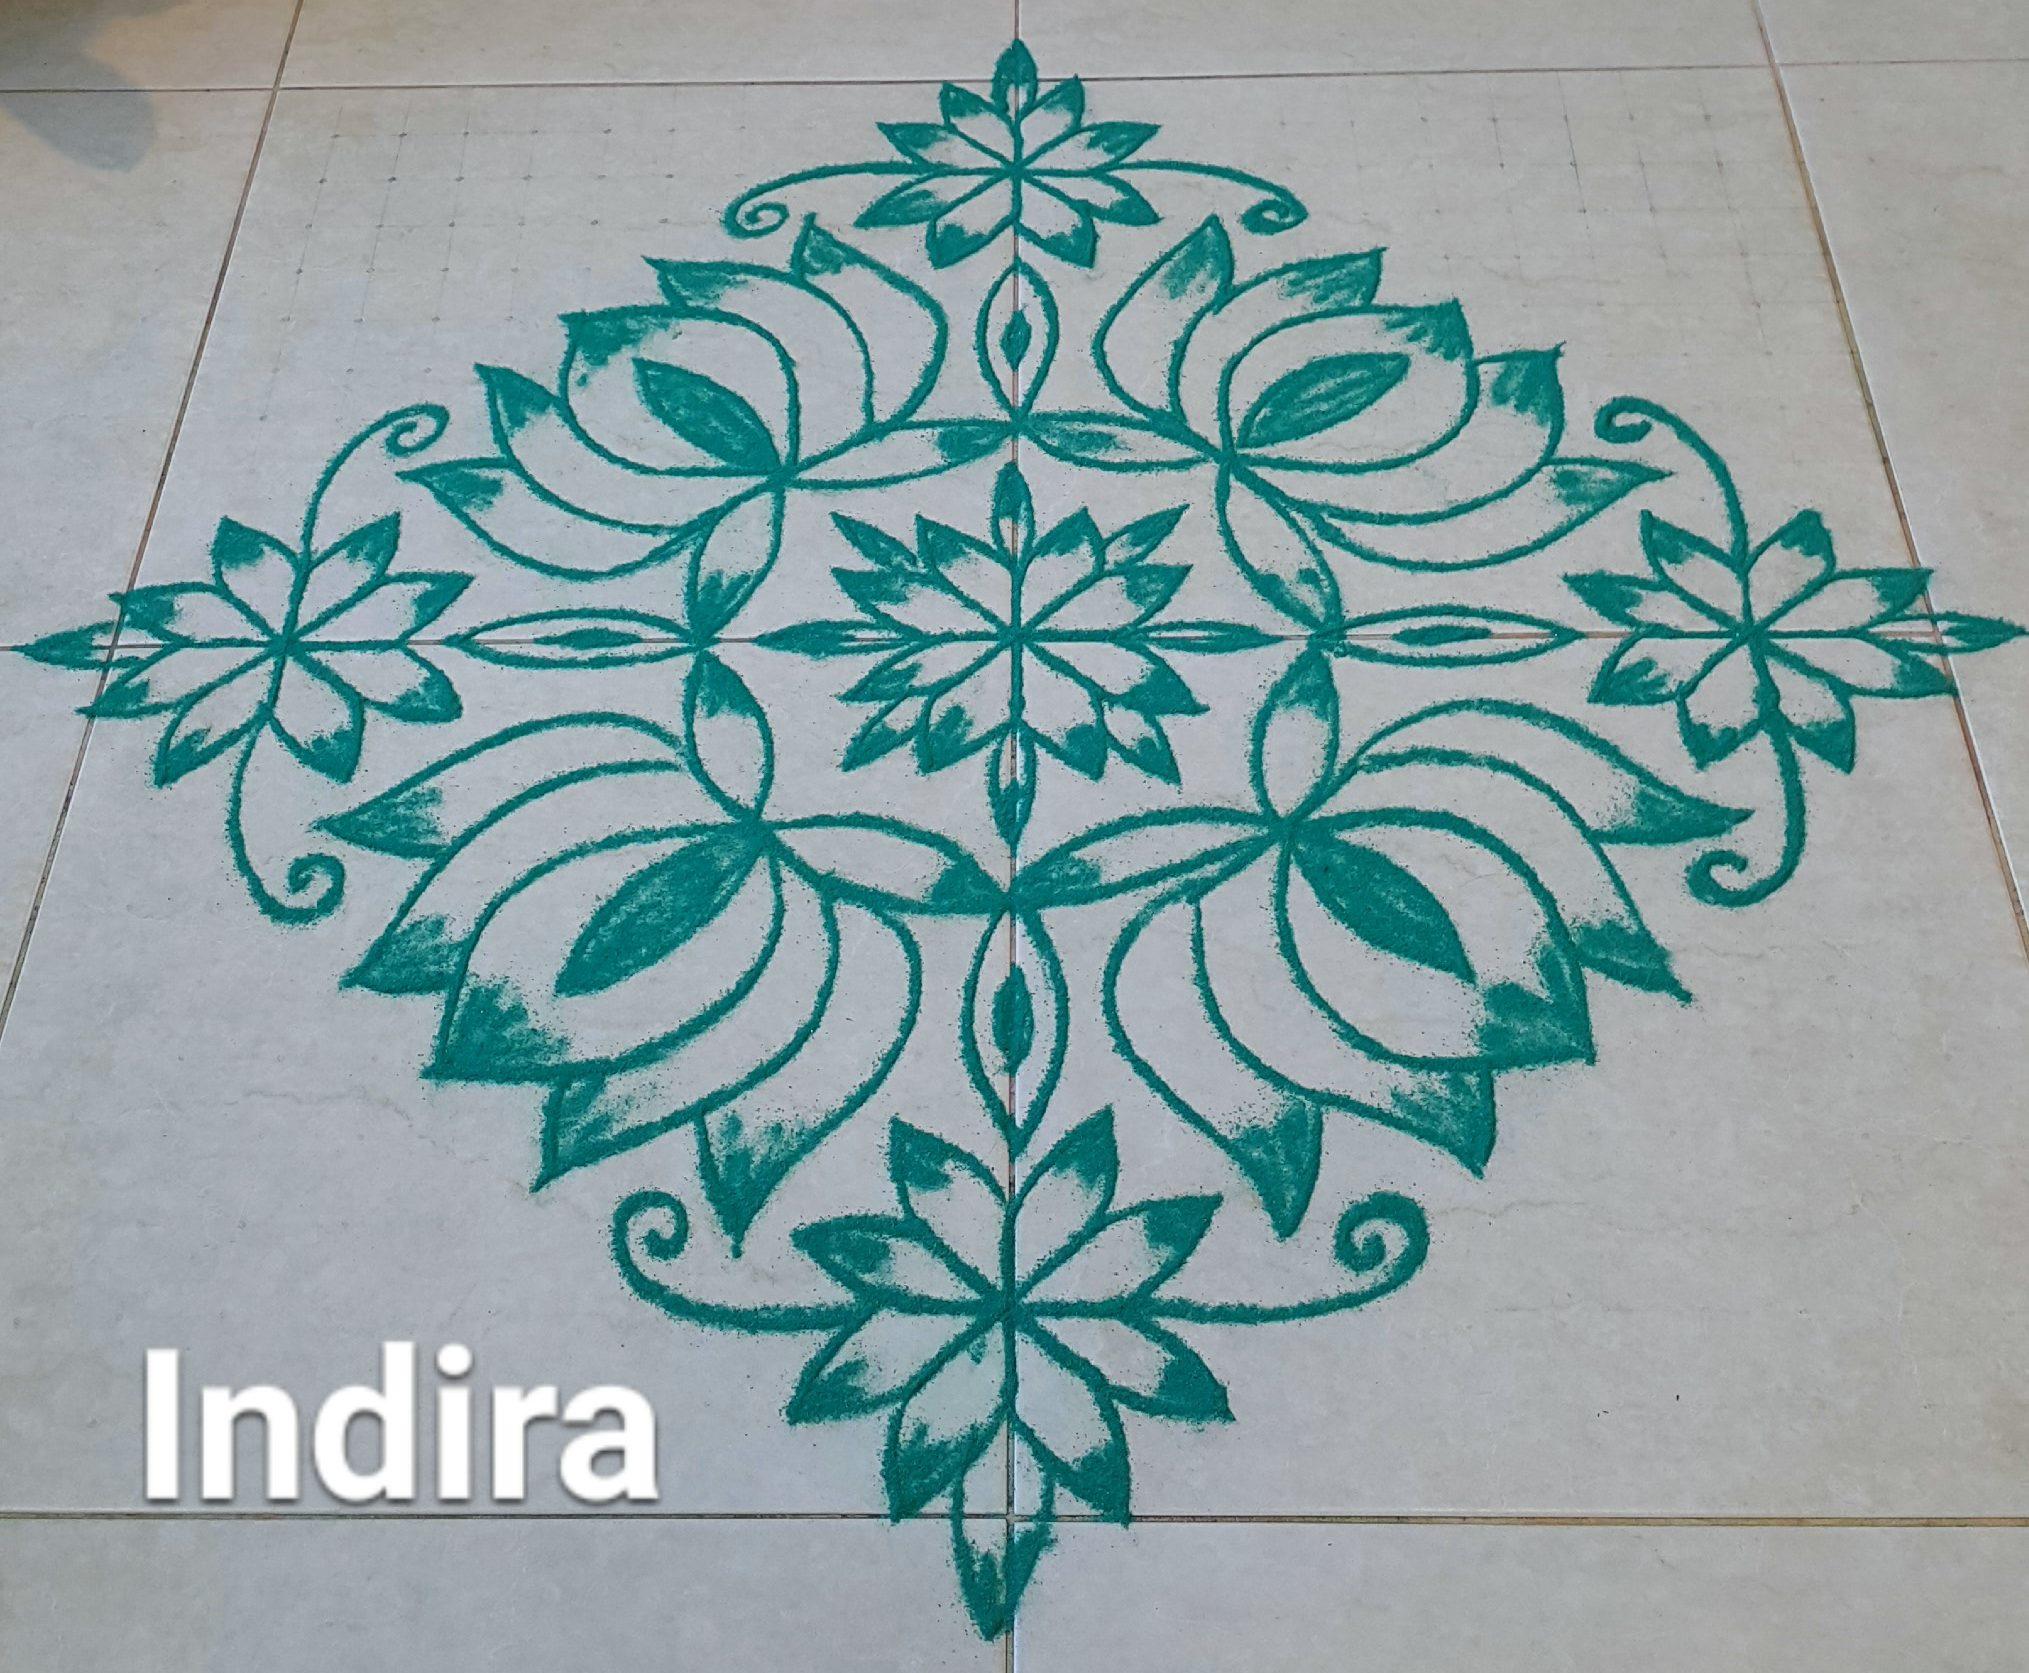 25 Dots Lotus Flower kolam for contest